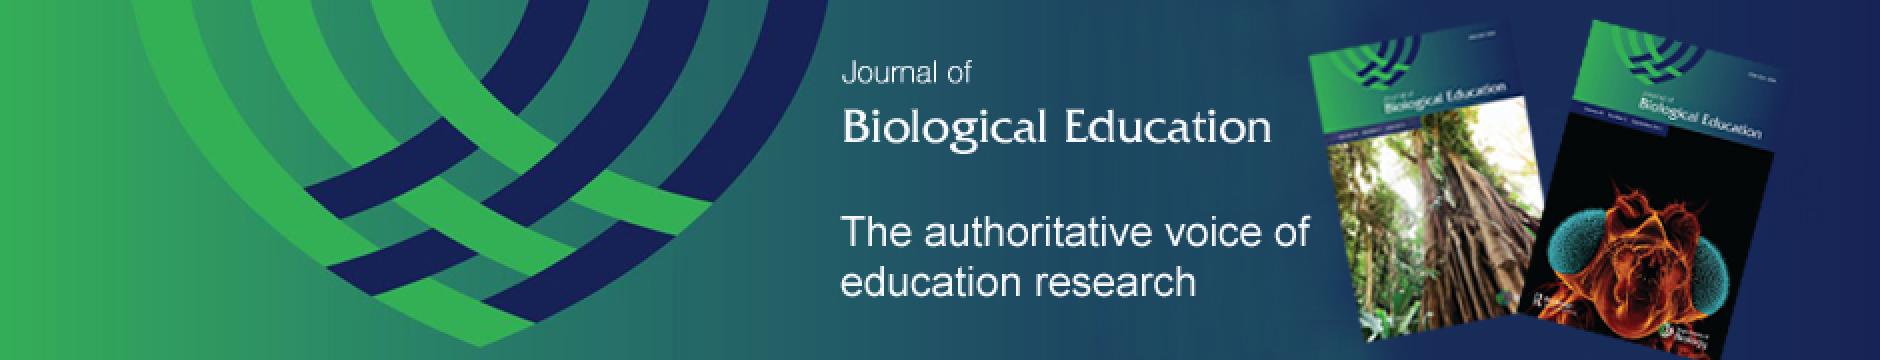 Journal of Biological Education